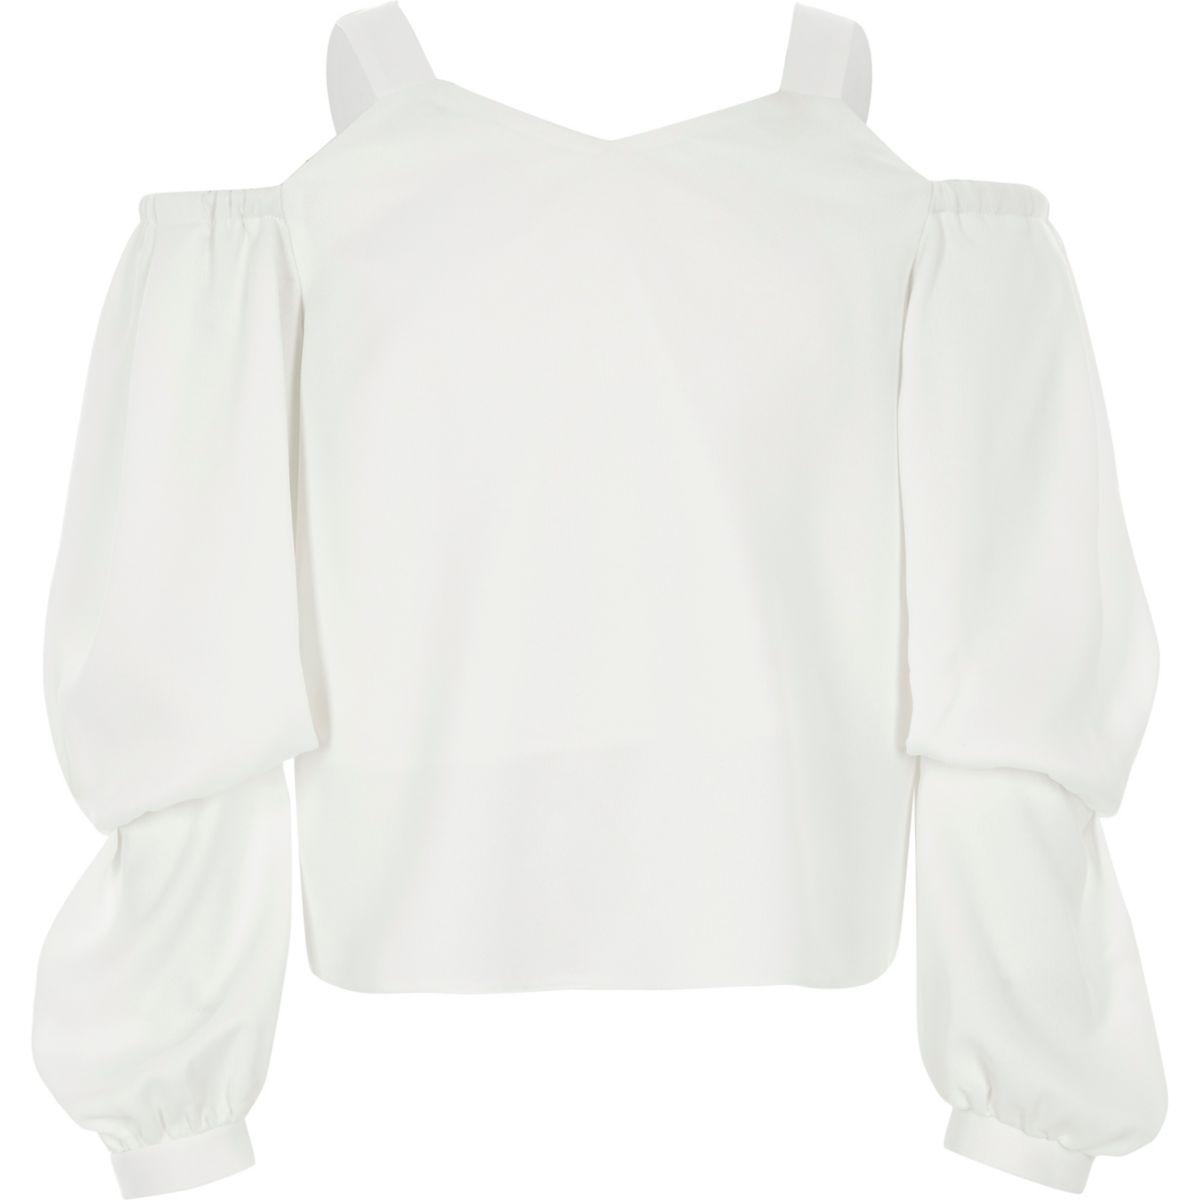 Girls cream satin long puff sleeve top